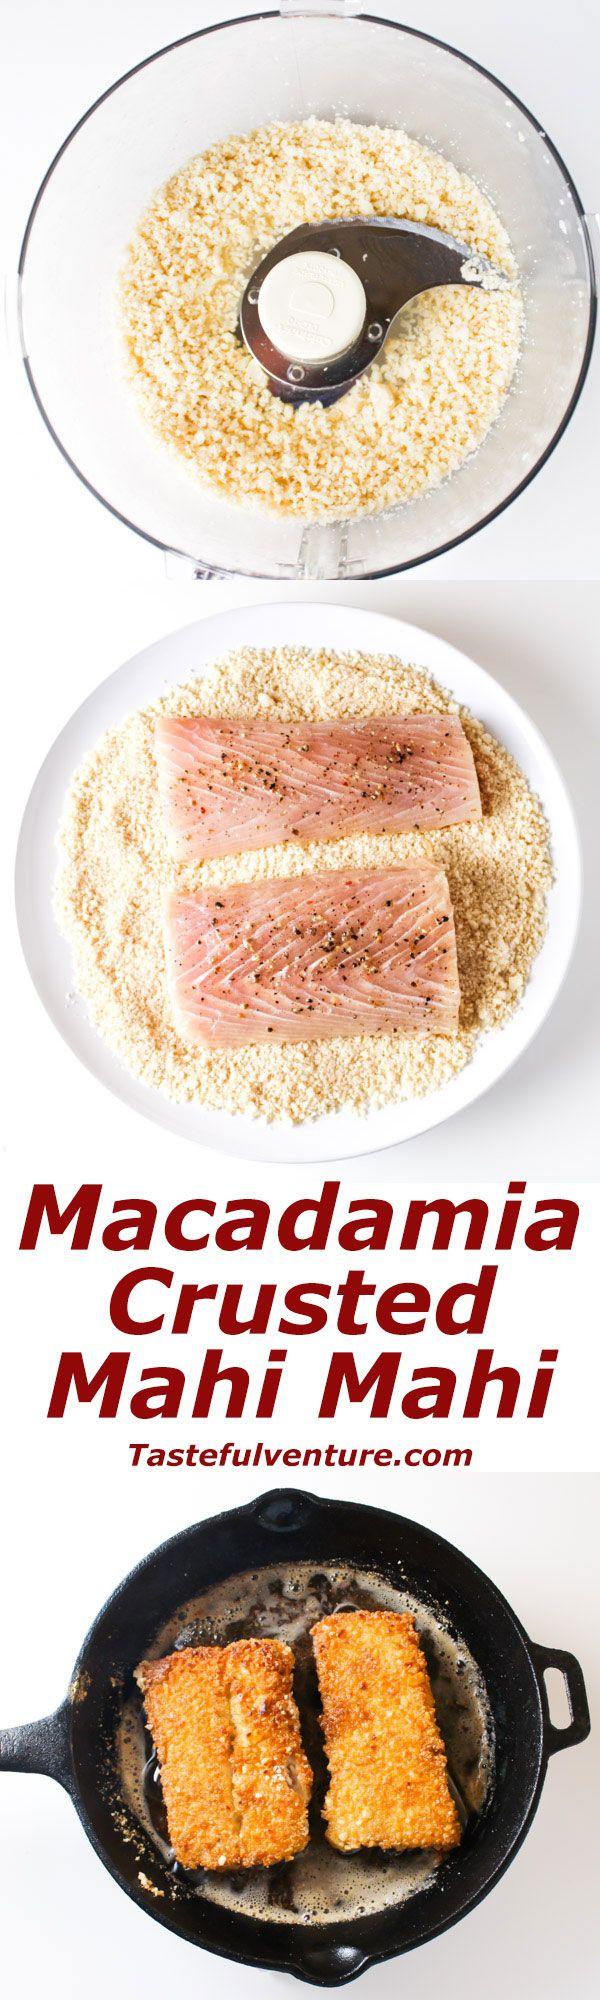 Macadamia Crusted Mahi Mahi that is so easy to make, ready in under 30 Minutes, plus it's Gluten Free! | Tastefulventure.com